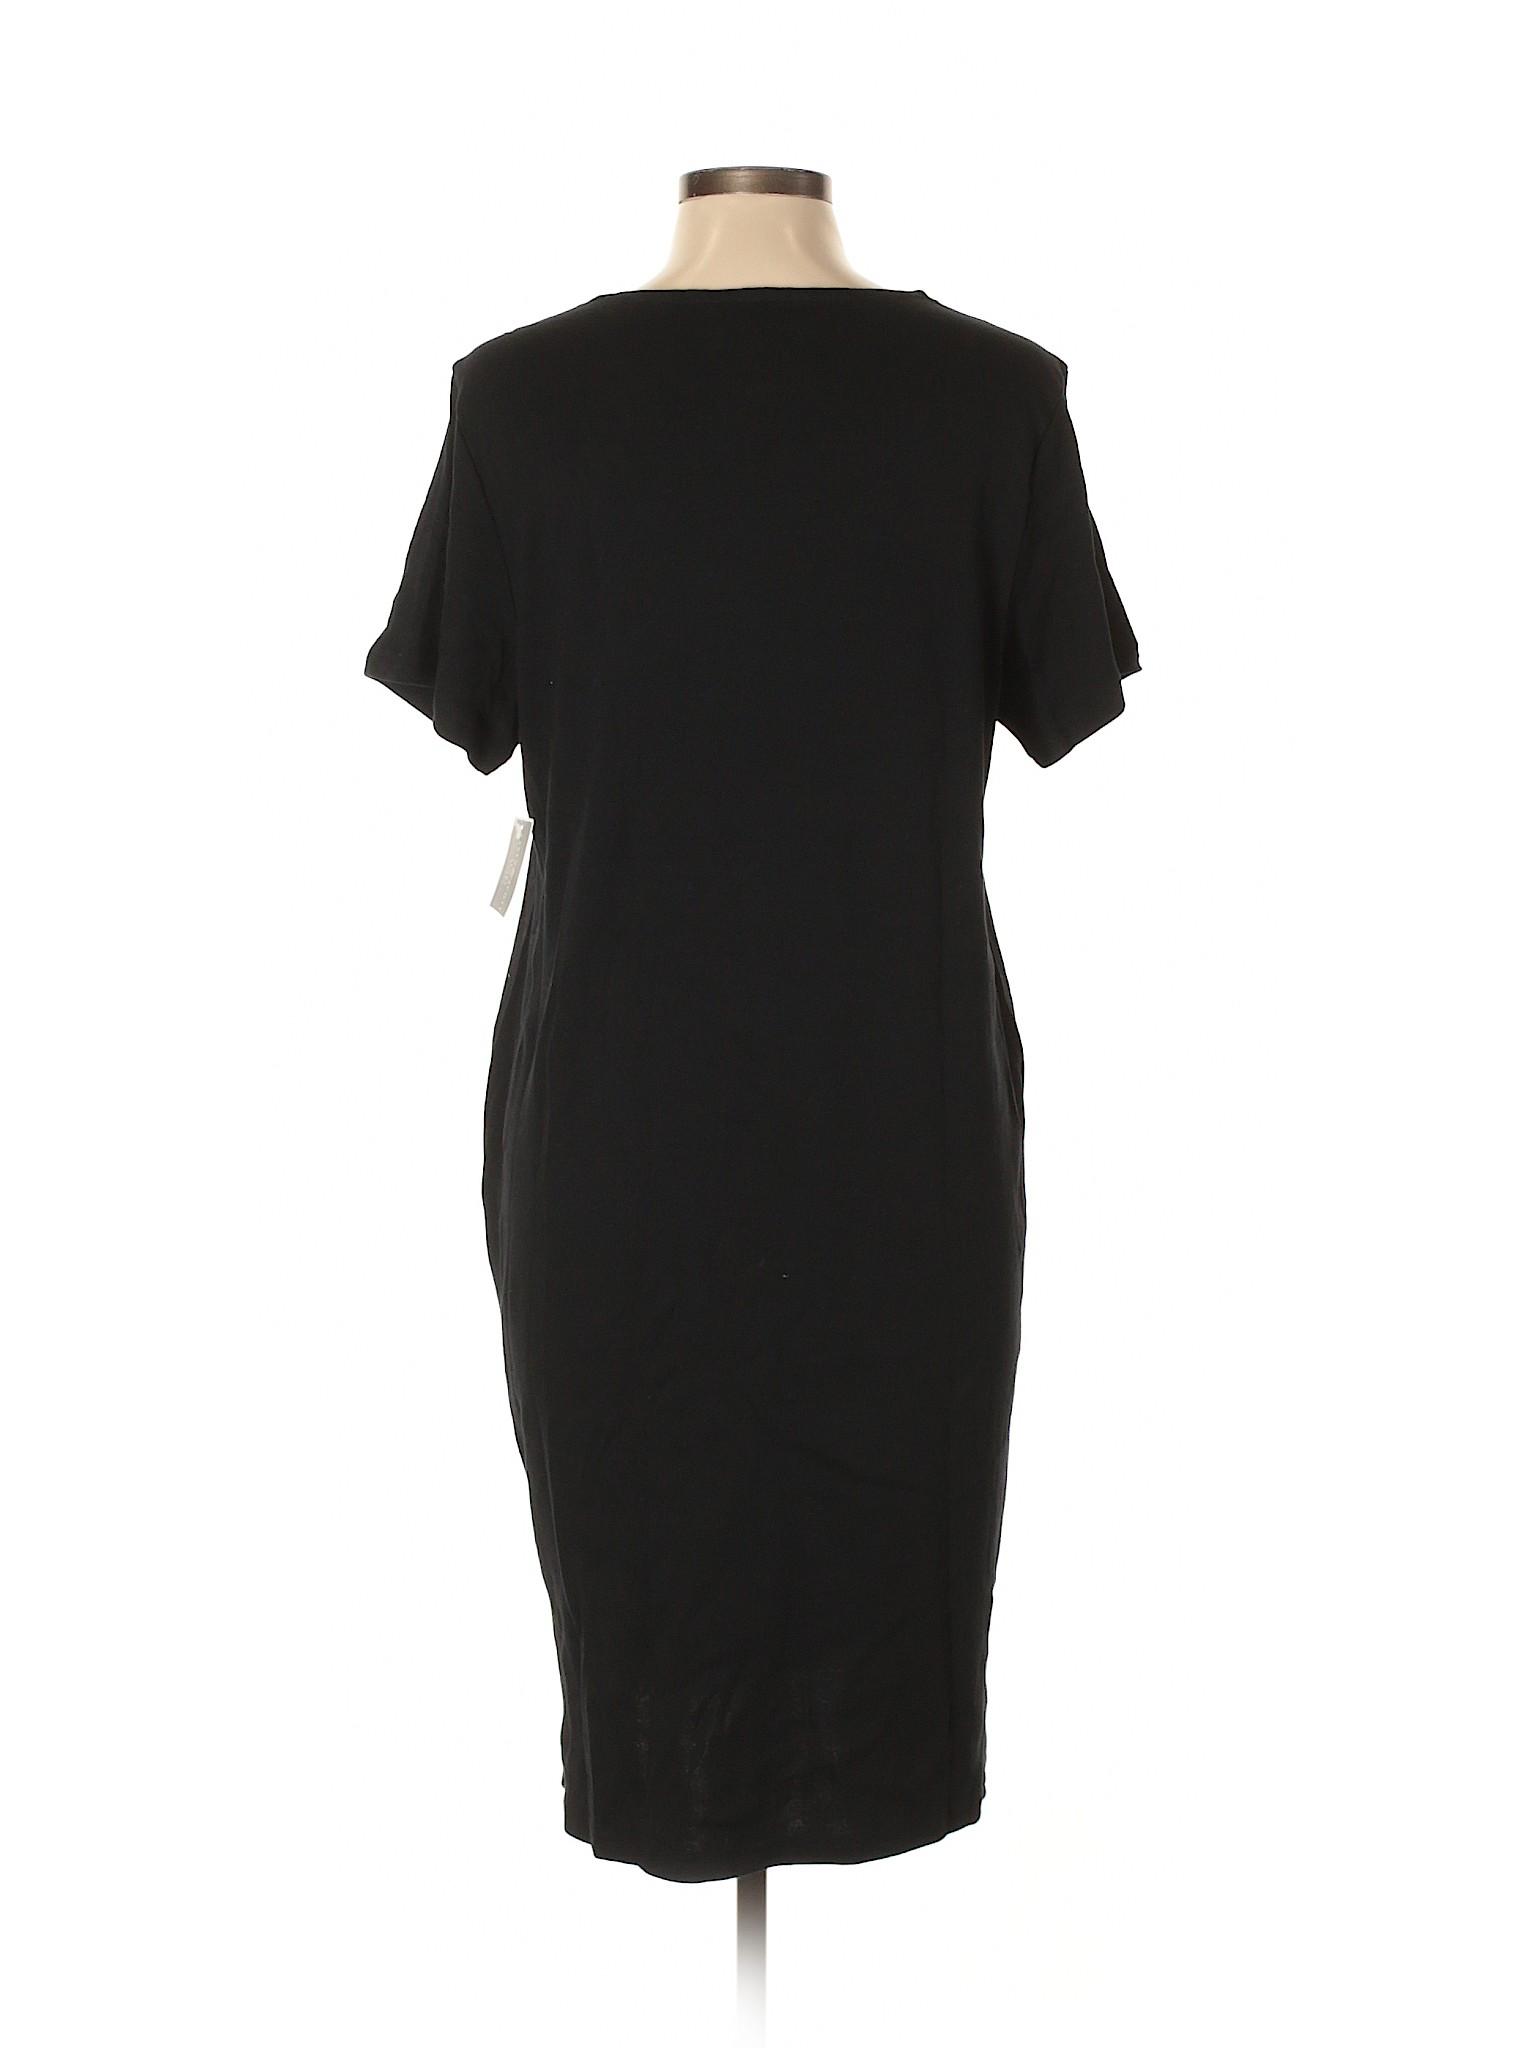 Selling Selling Karen Karen Dress Scott Casual Casual Dress Scott fdcqH4w